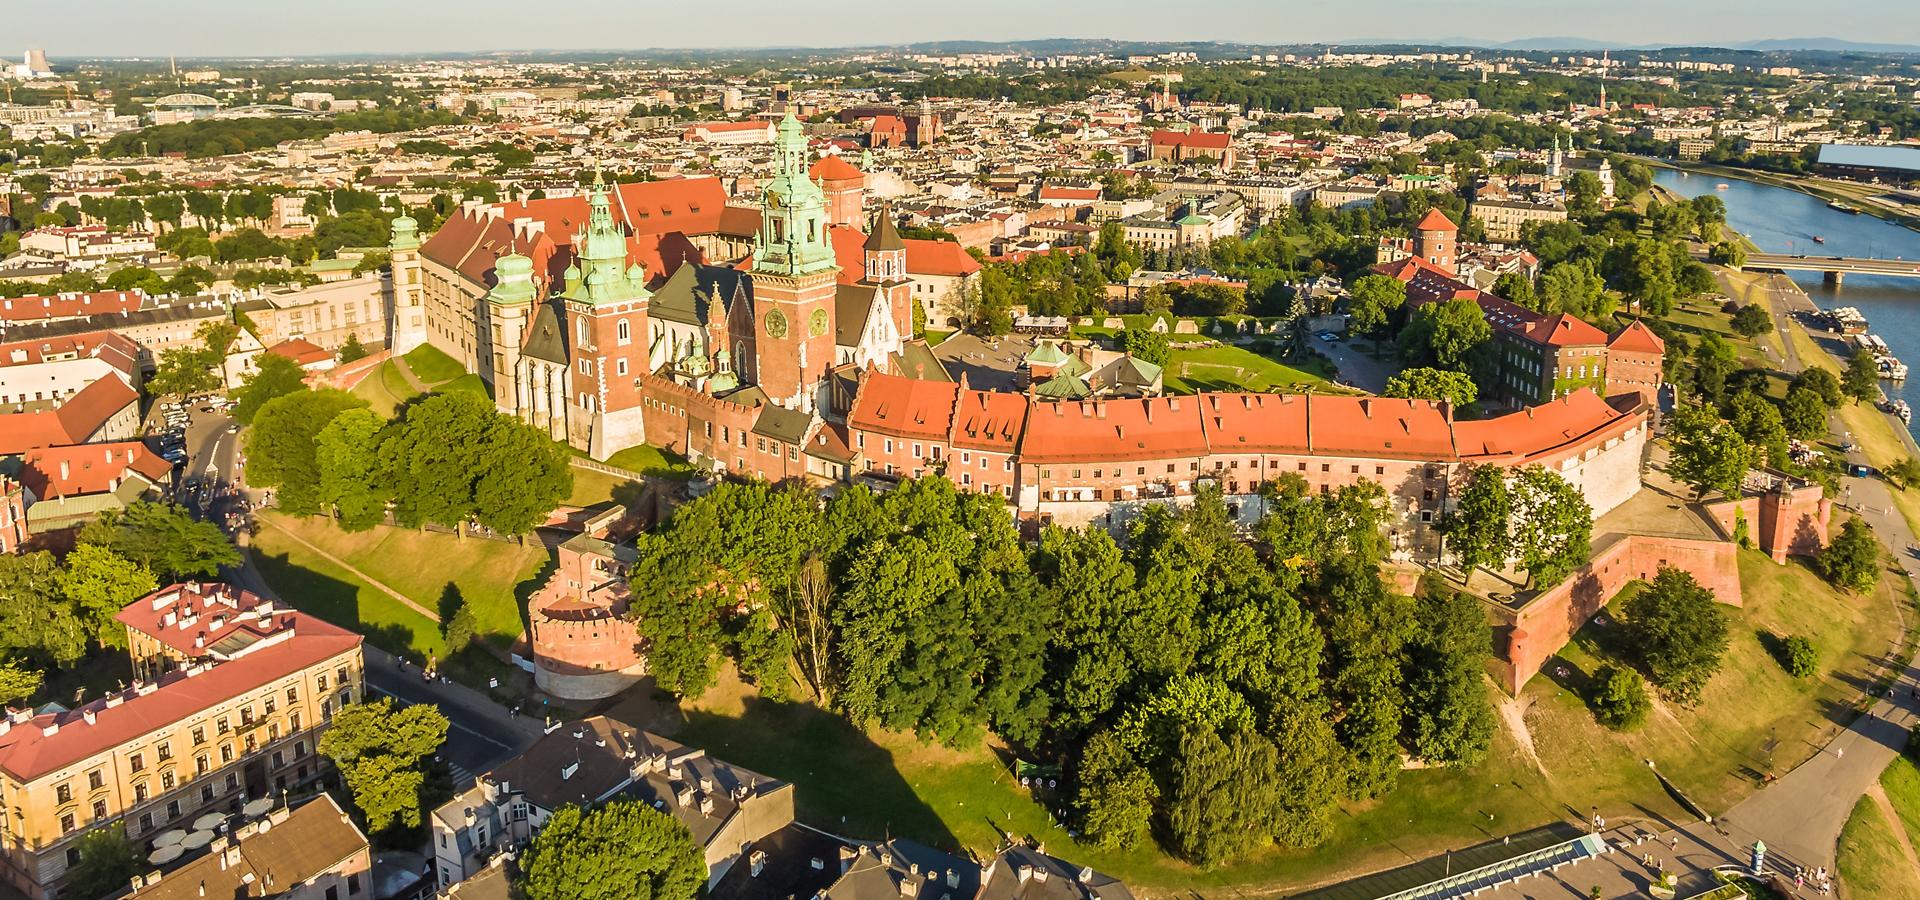 Peer-to-peer advisory in Kamienica, Lesser Poland, Poland